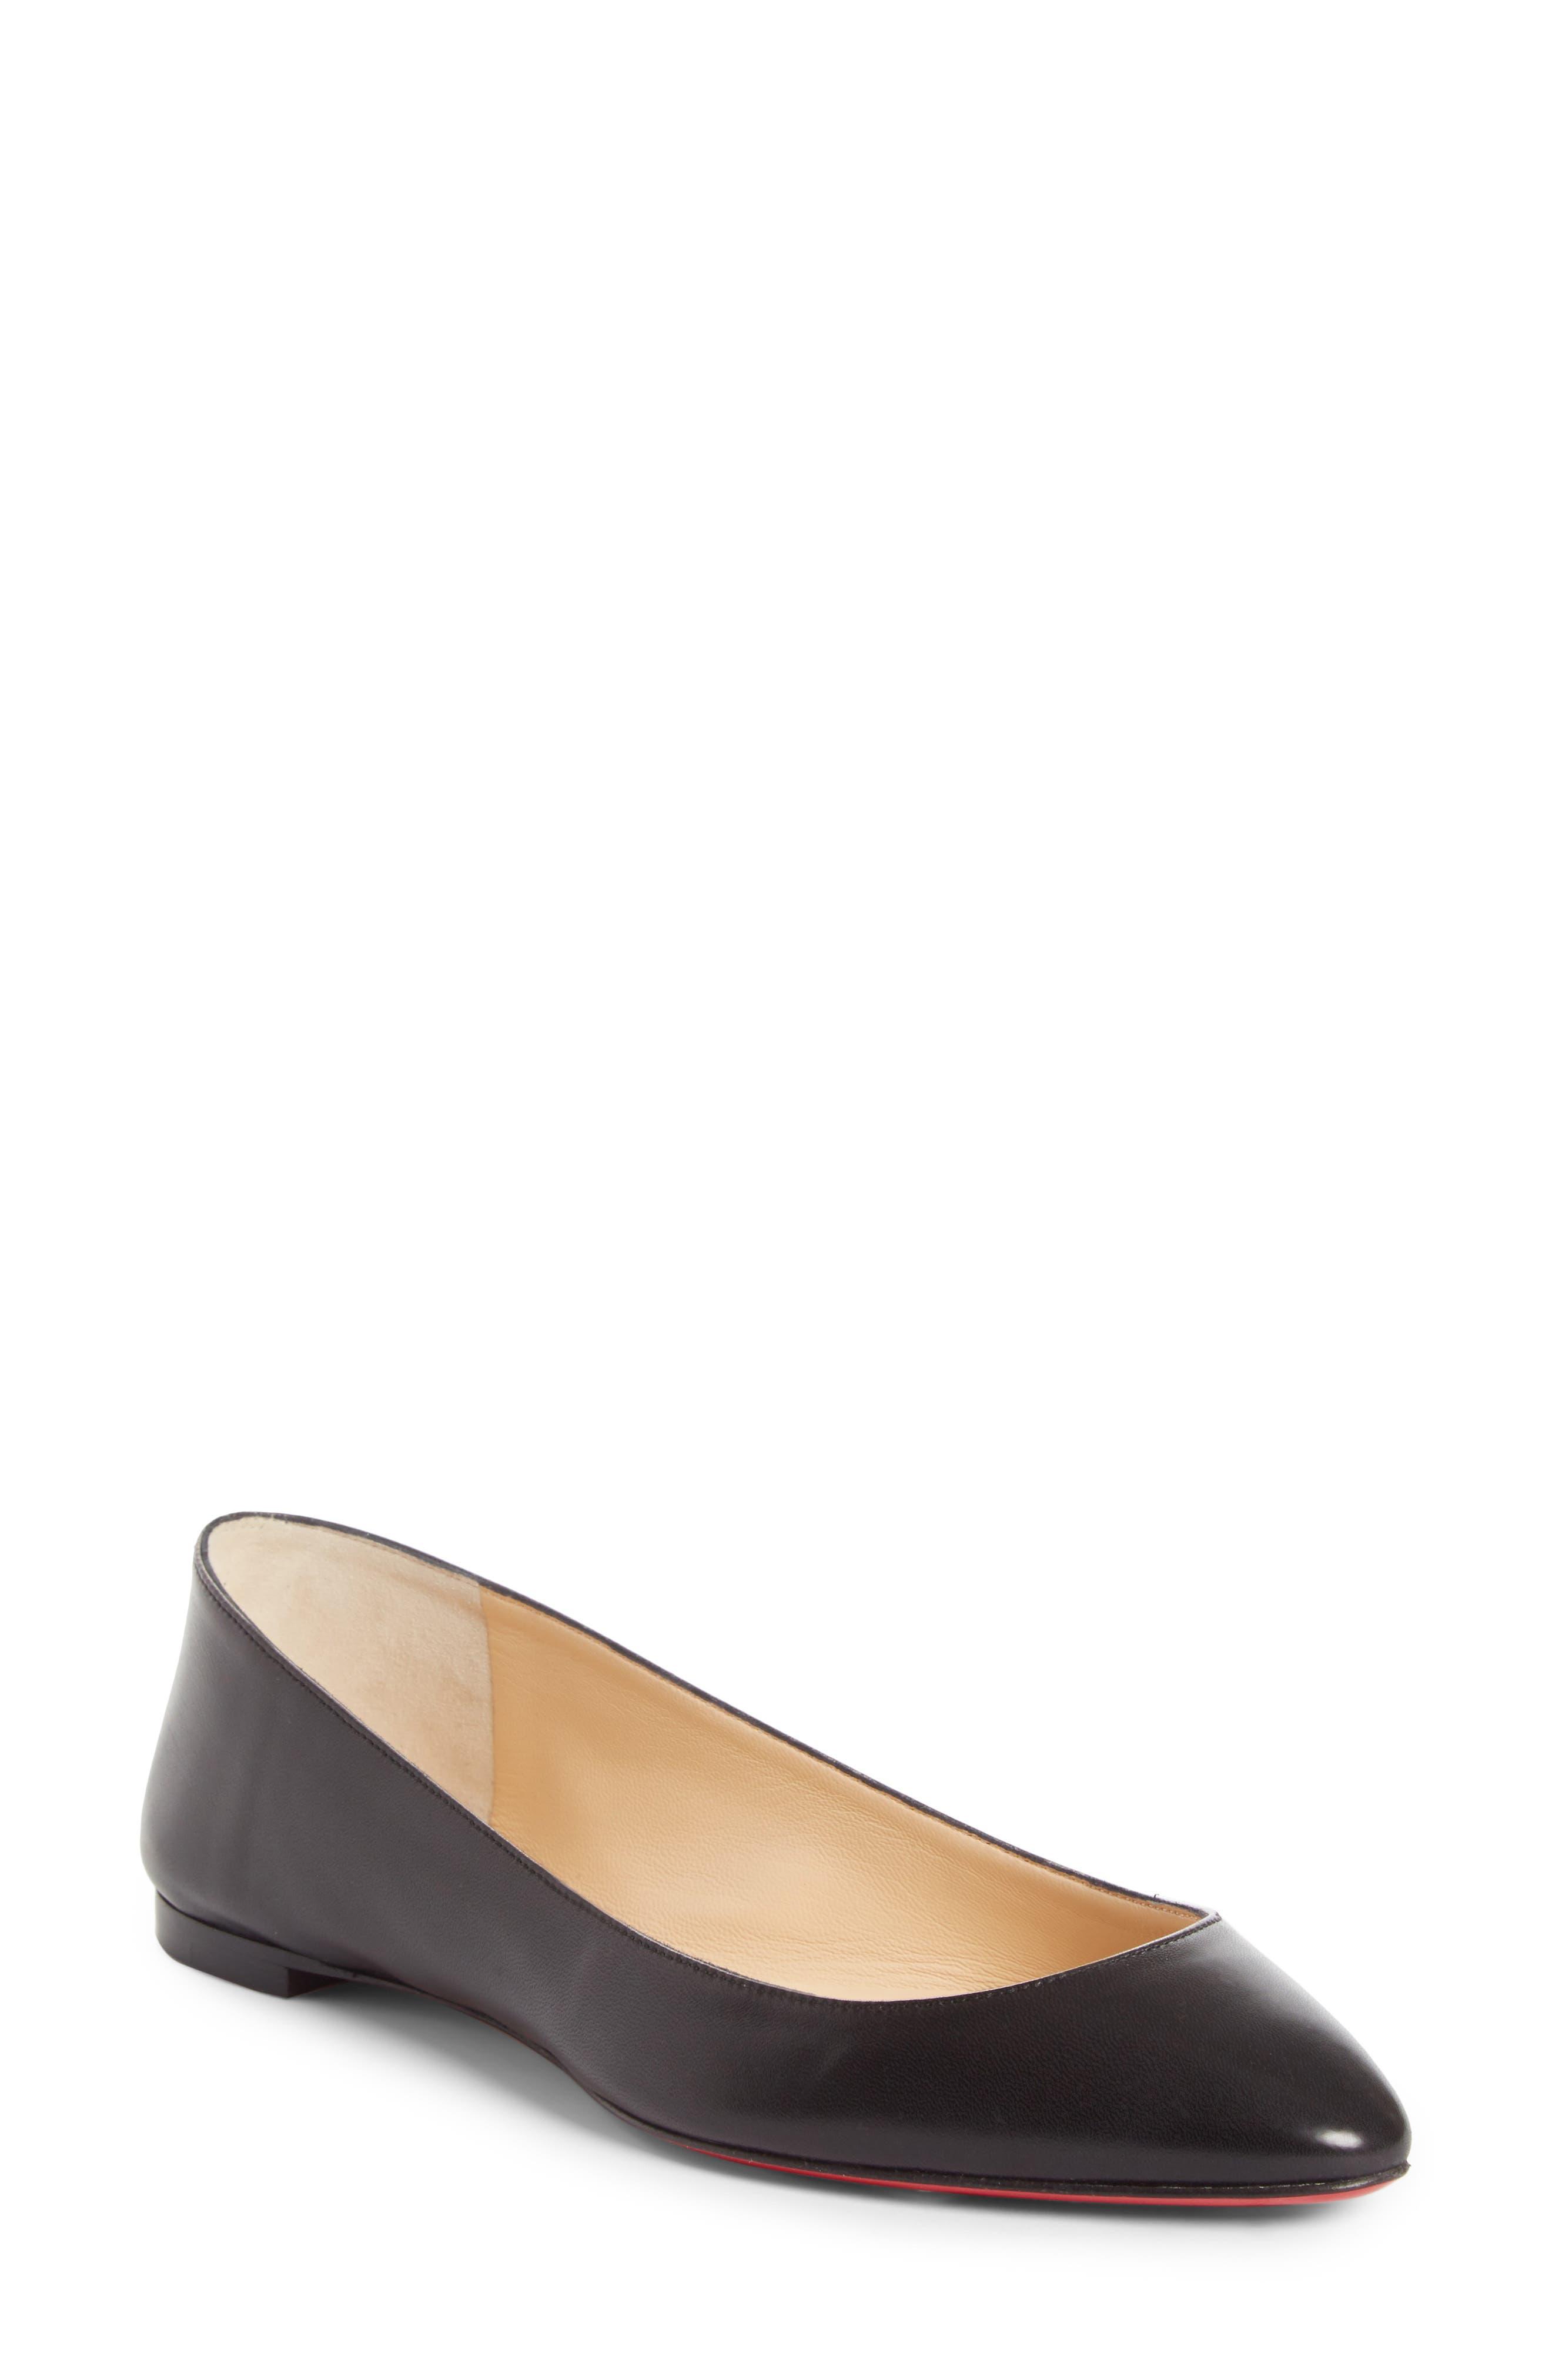 Eloise Flat,                             Main thumbnail 1, color,                             Black Leather